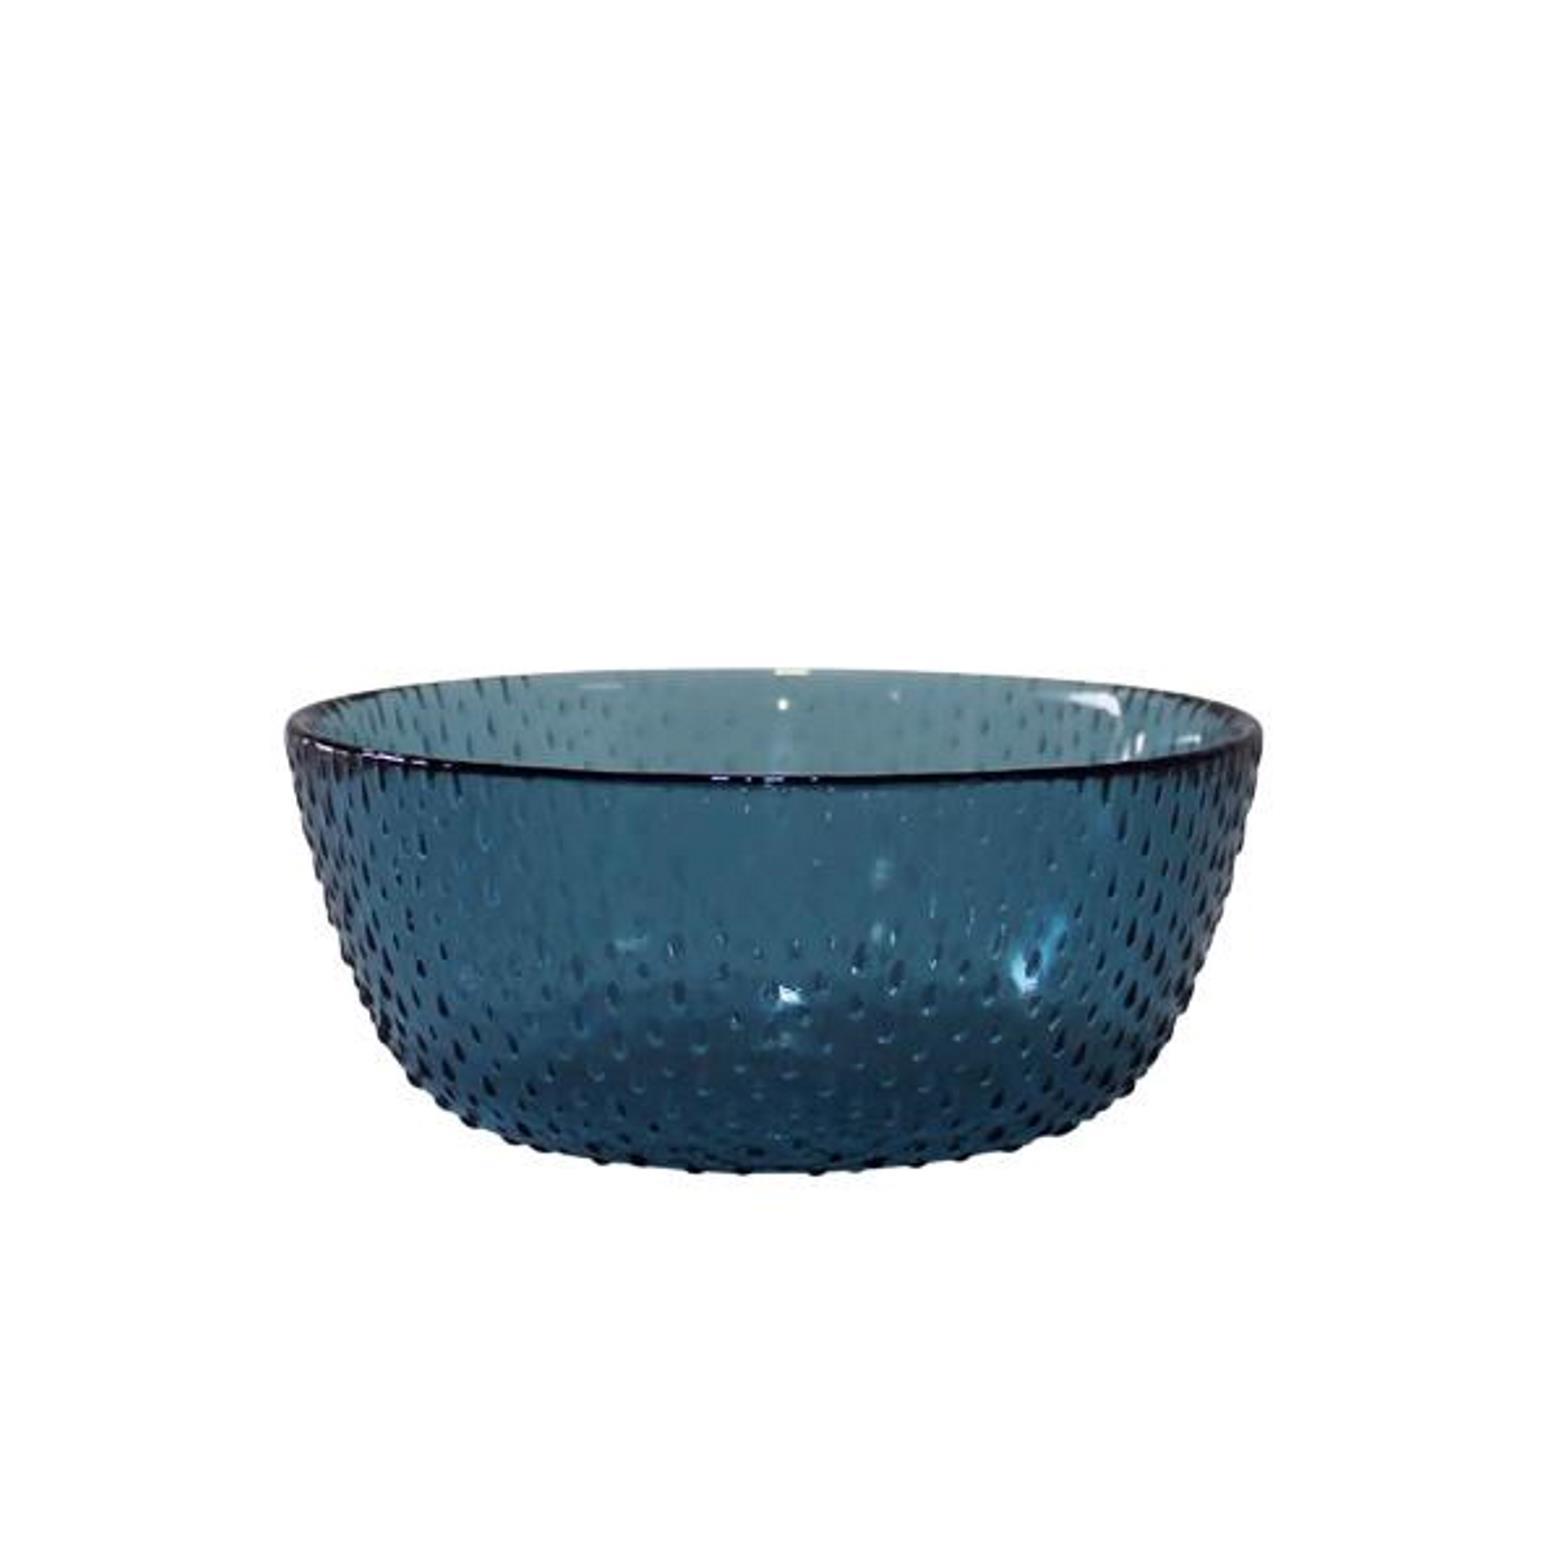 Онлайн каталог PROMENU: Пиала Aida RAW, диаметр 26,5 см, высота 9 см, прозрачный синий                               15076